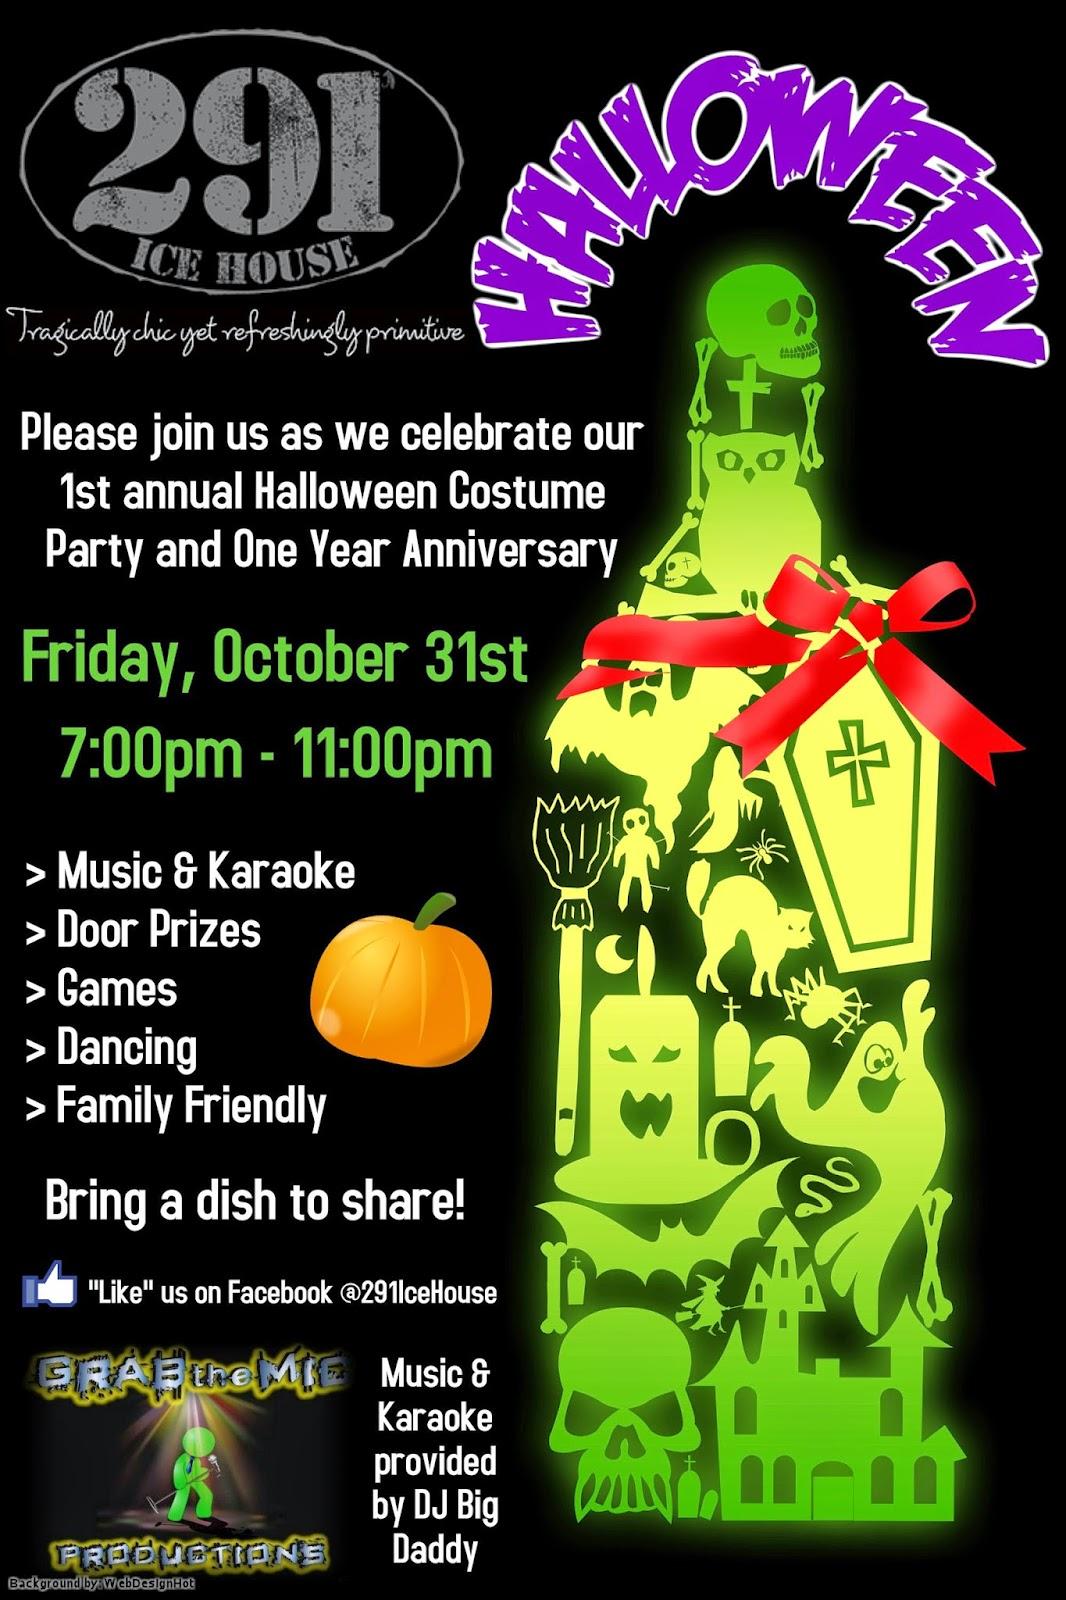 Halloween Fun in Washington County | Visit Brenham Texas